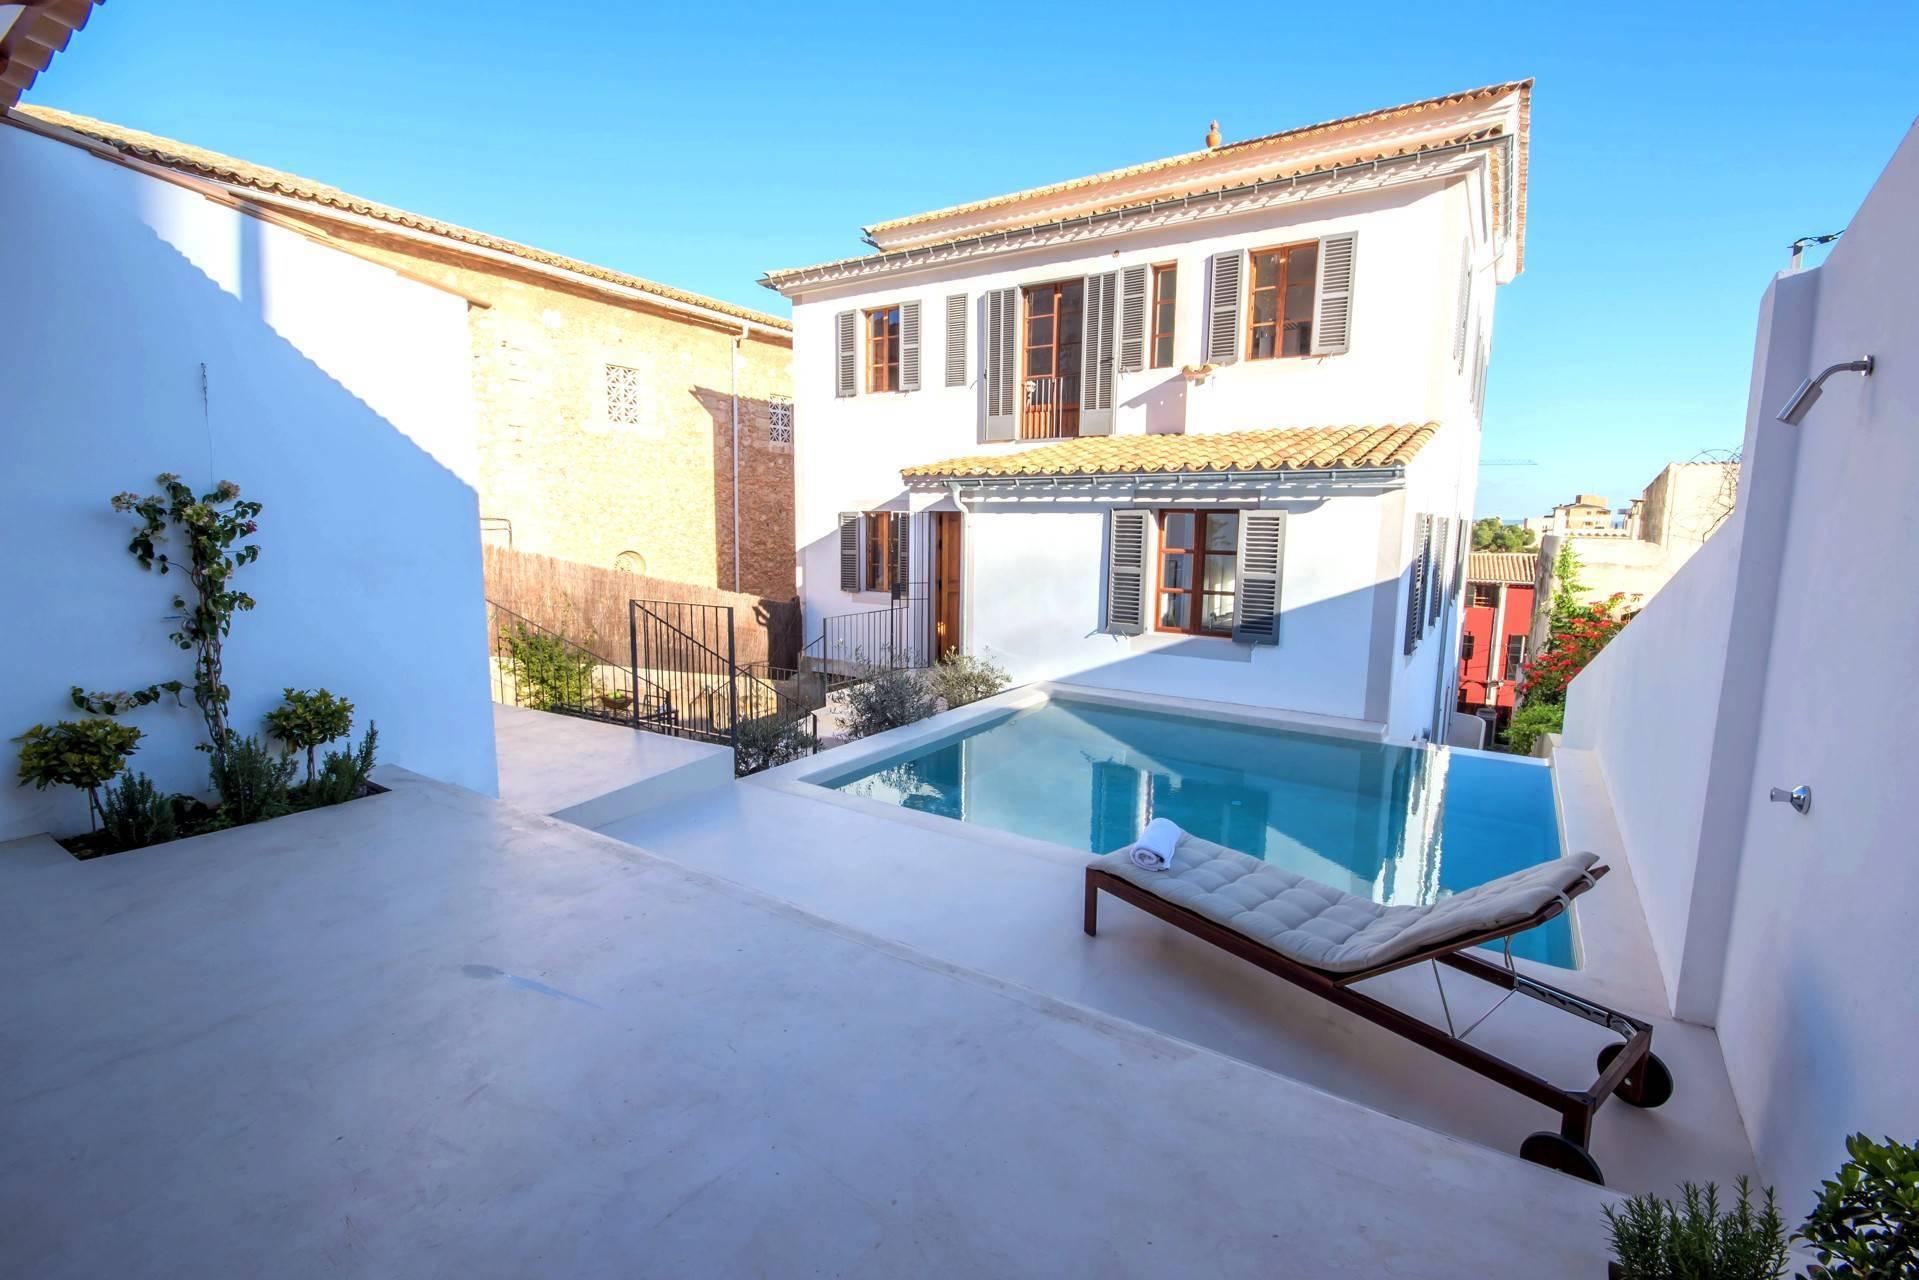 01-257 Luxus Ferienhaus Mallorca Südwesten Bild 1